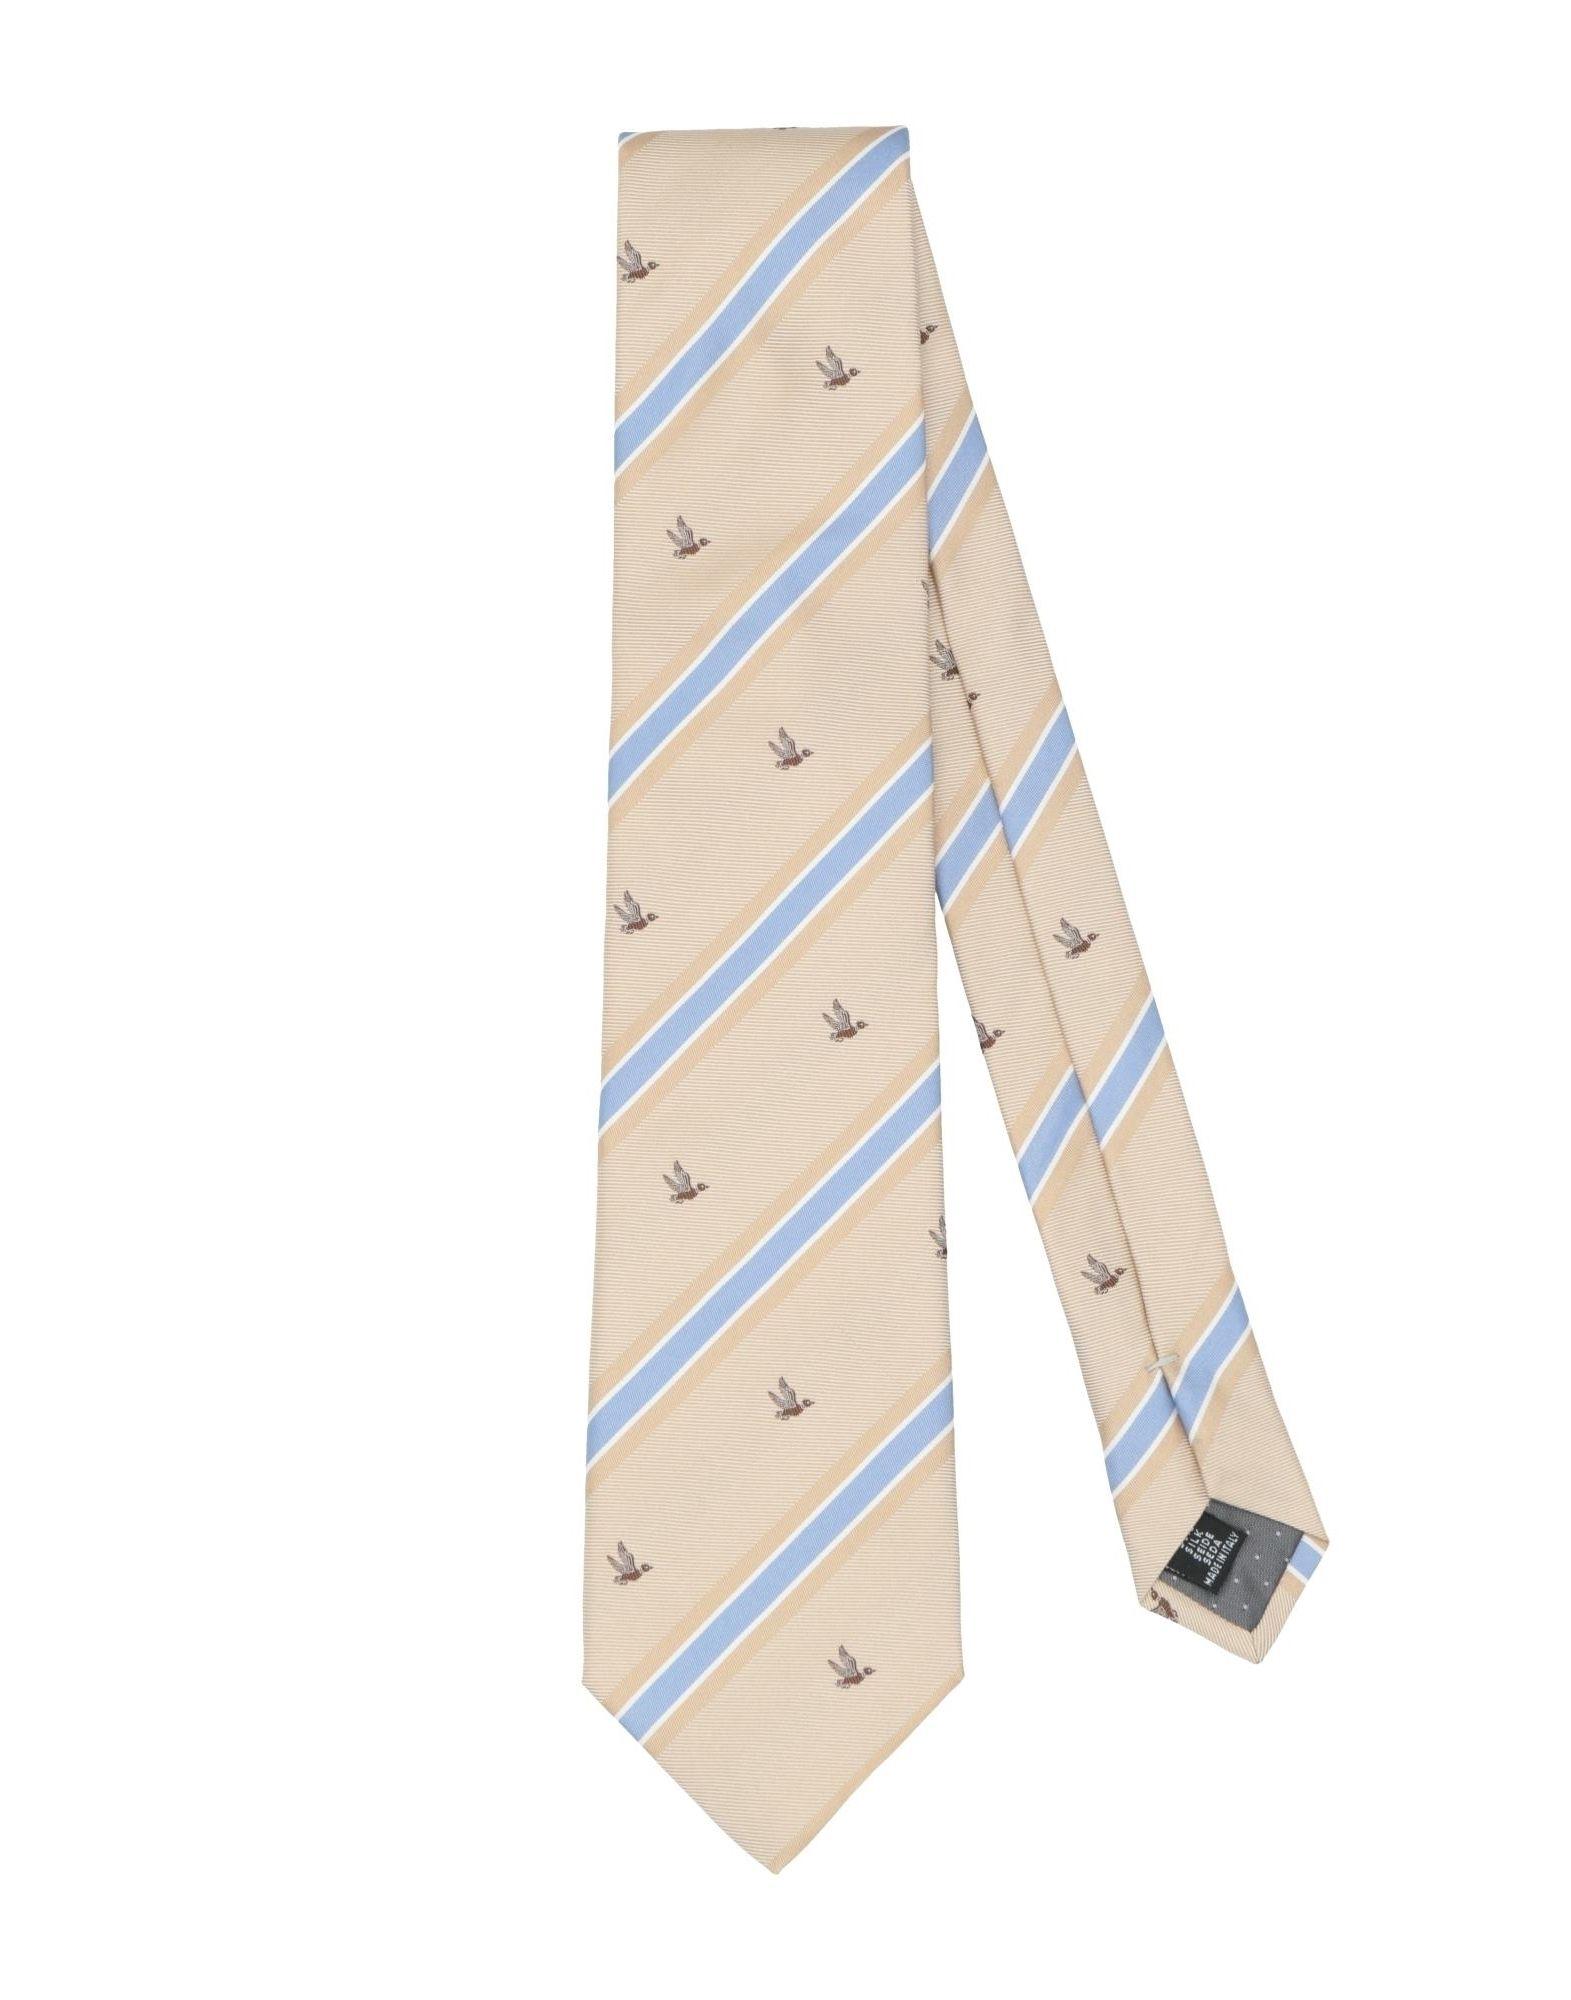 GALLIENI Галстук billionaire галстук